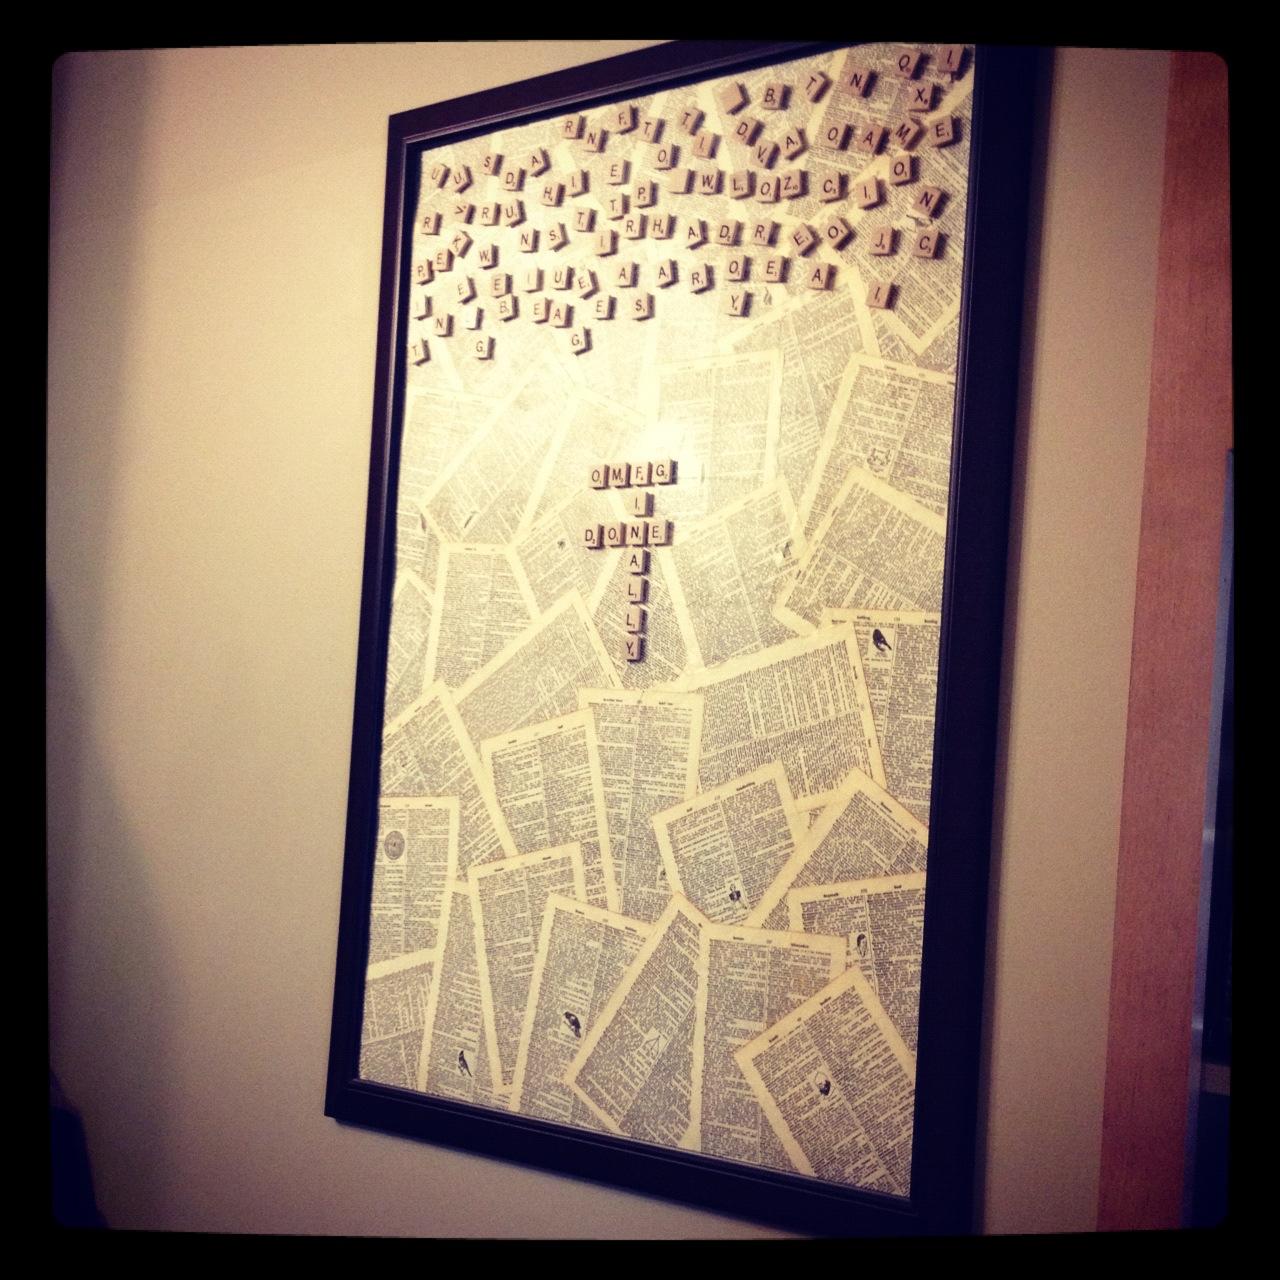 Modern Magnetic Board Wall Decor Crest - Wall Art Ideas - dochista.info